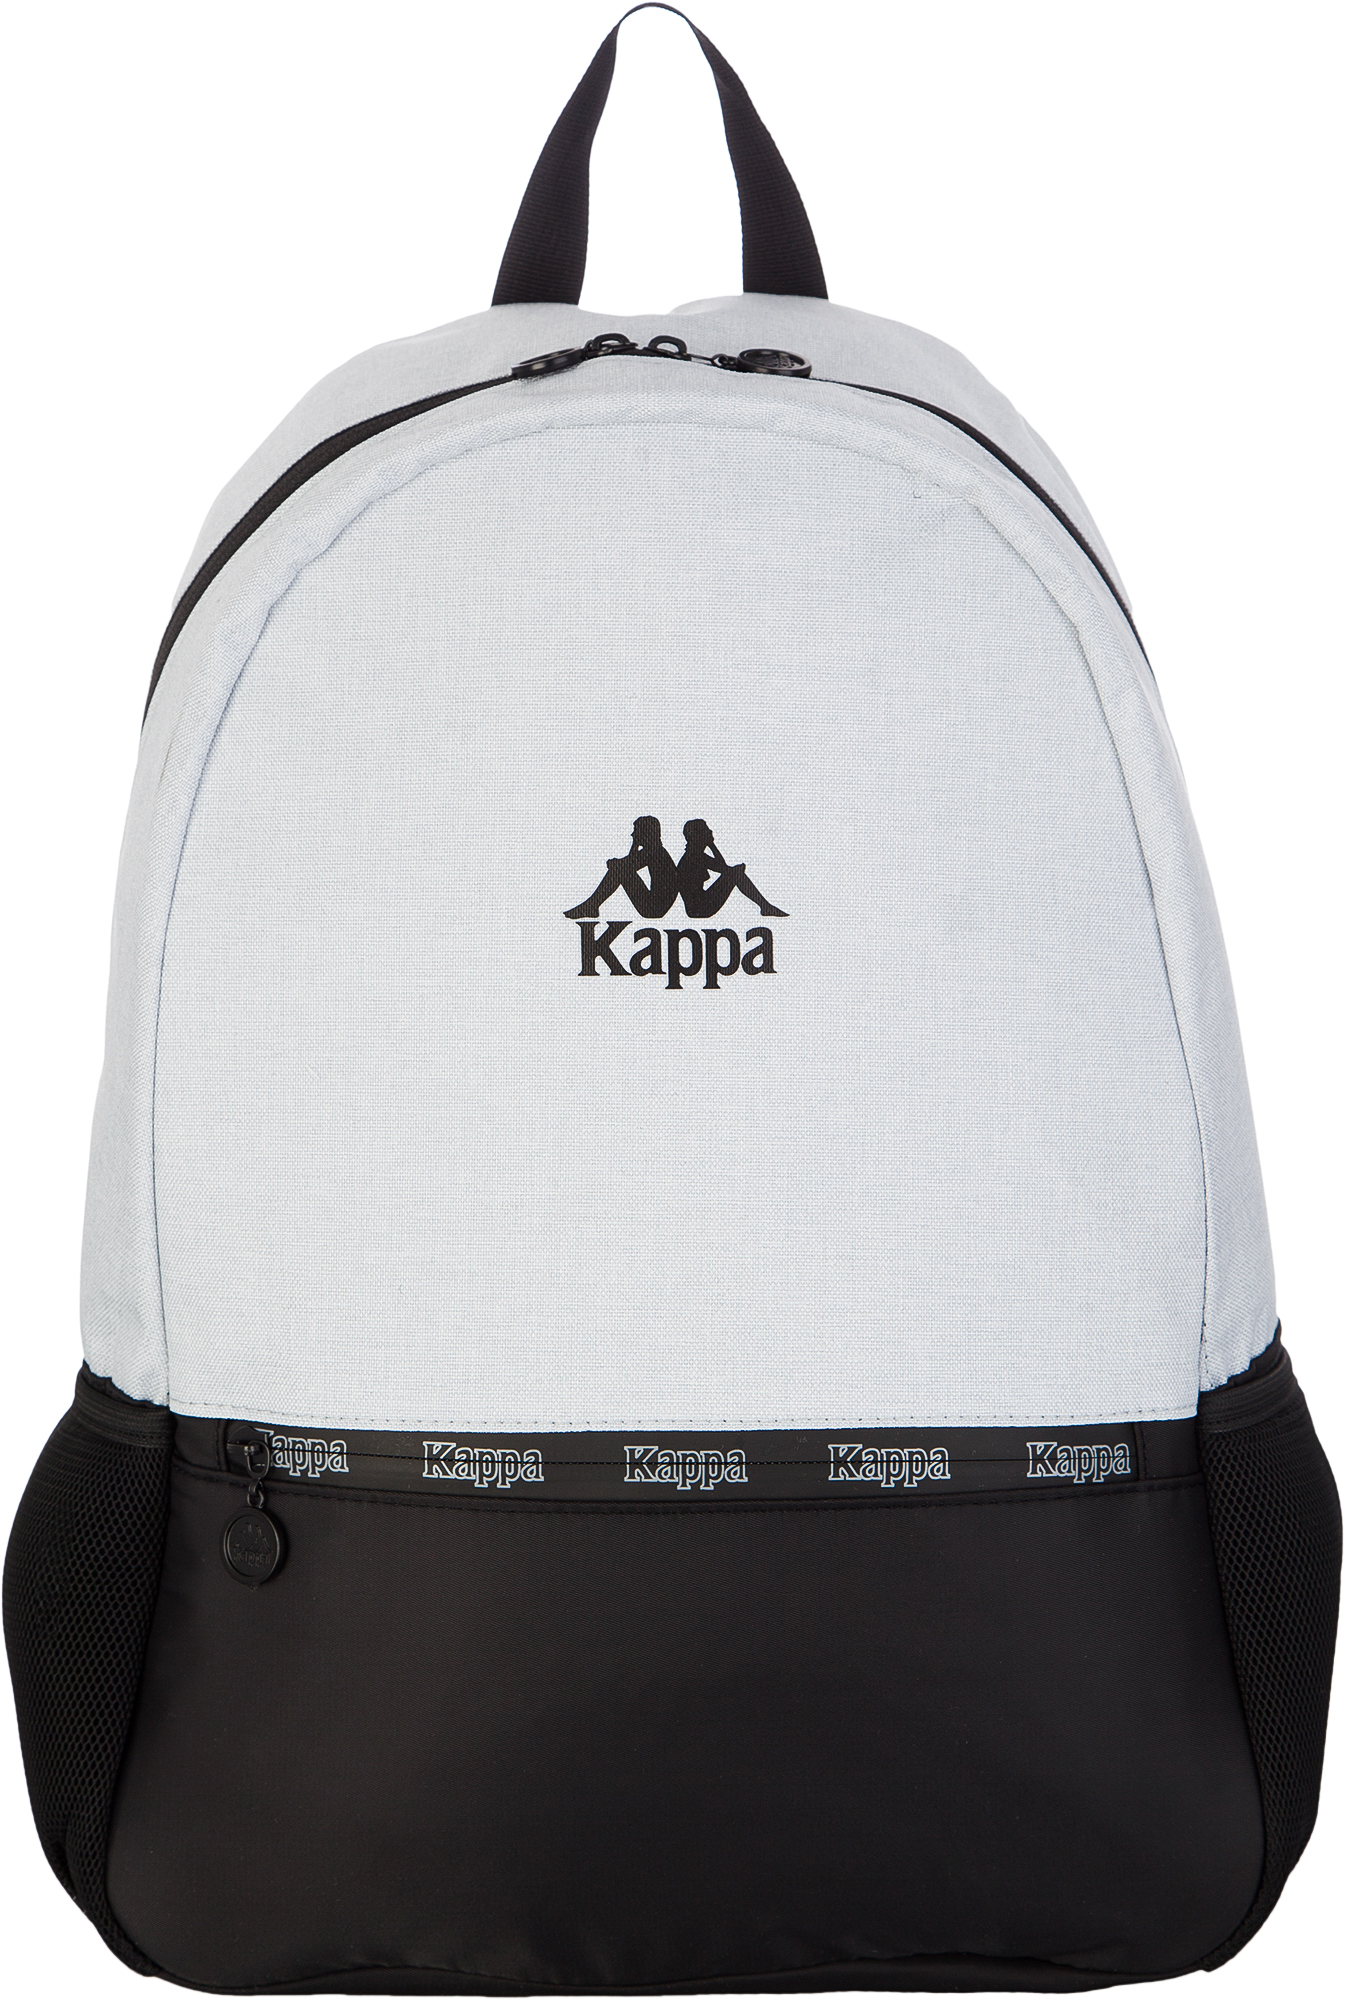 Kappa Рюкзак женский Kappa